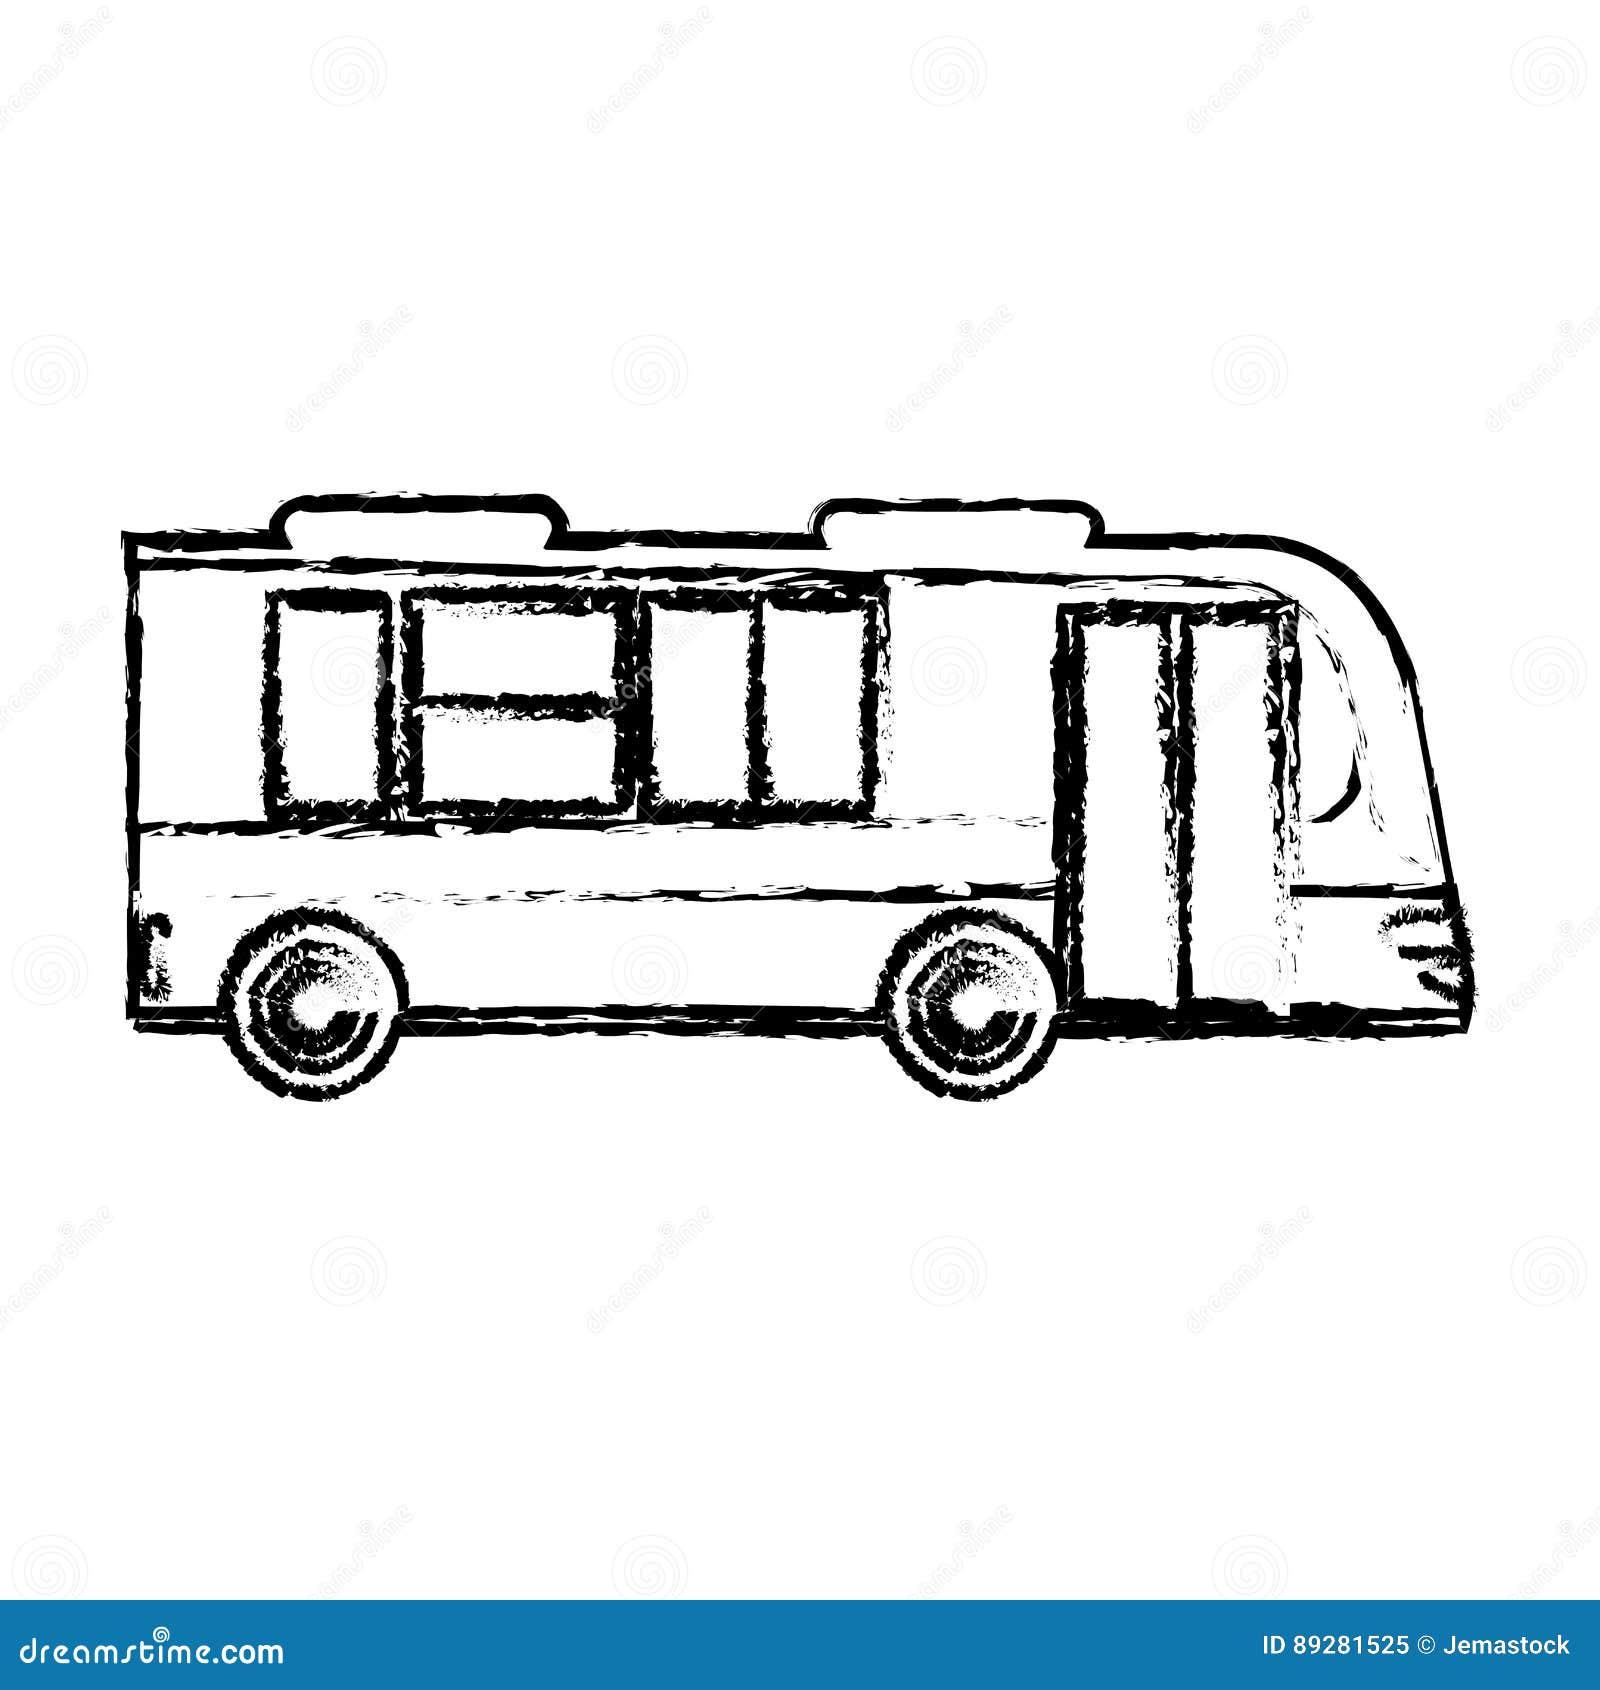 Bus Business Transport Vehicle Sketch Stock Illustration Illustration Of Goods Auto 89281525